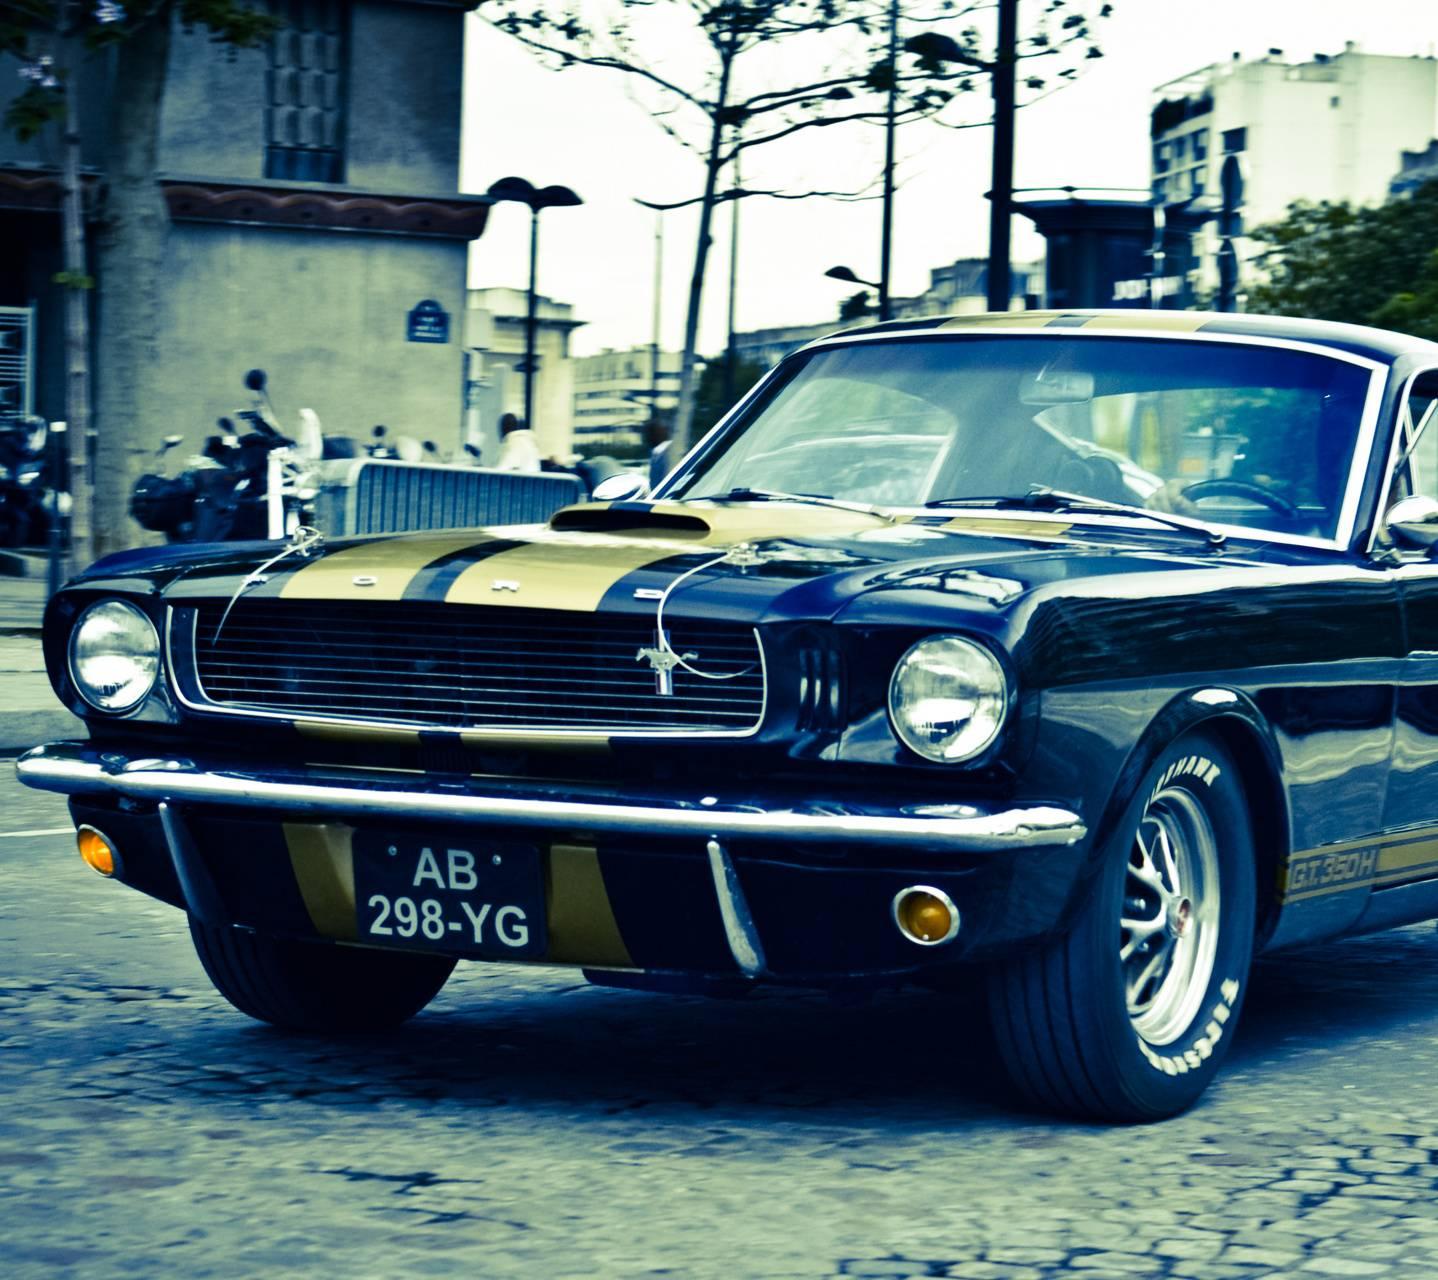 Black Sexy Mustang